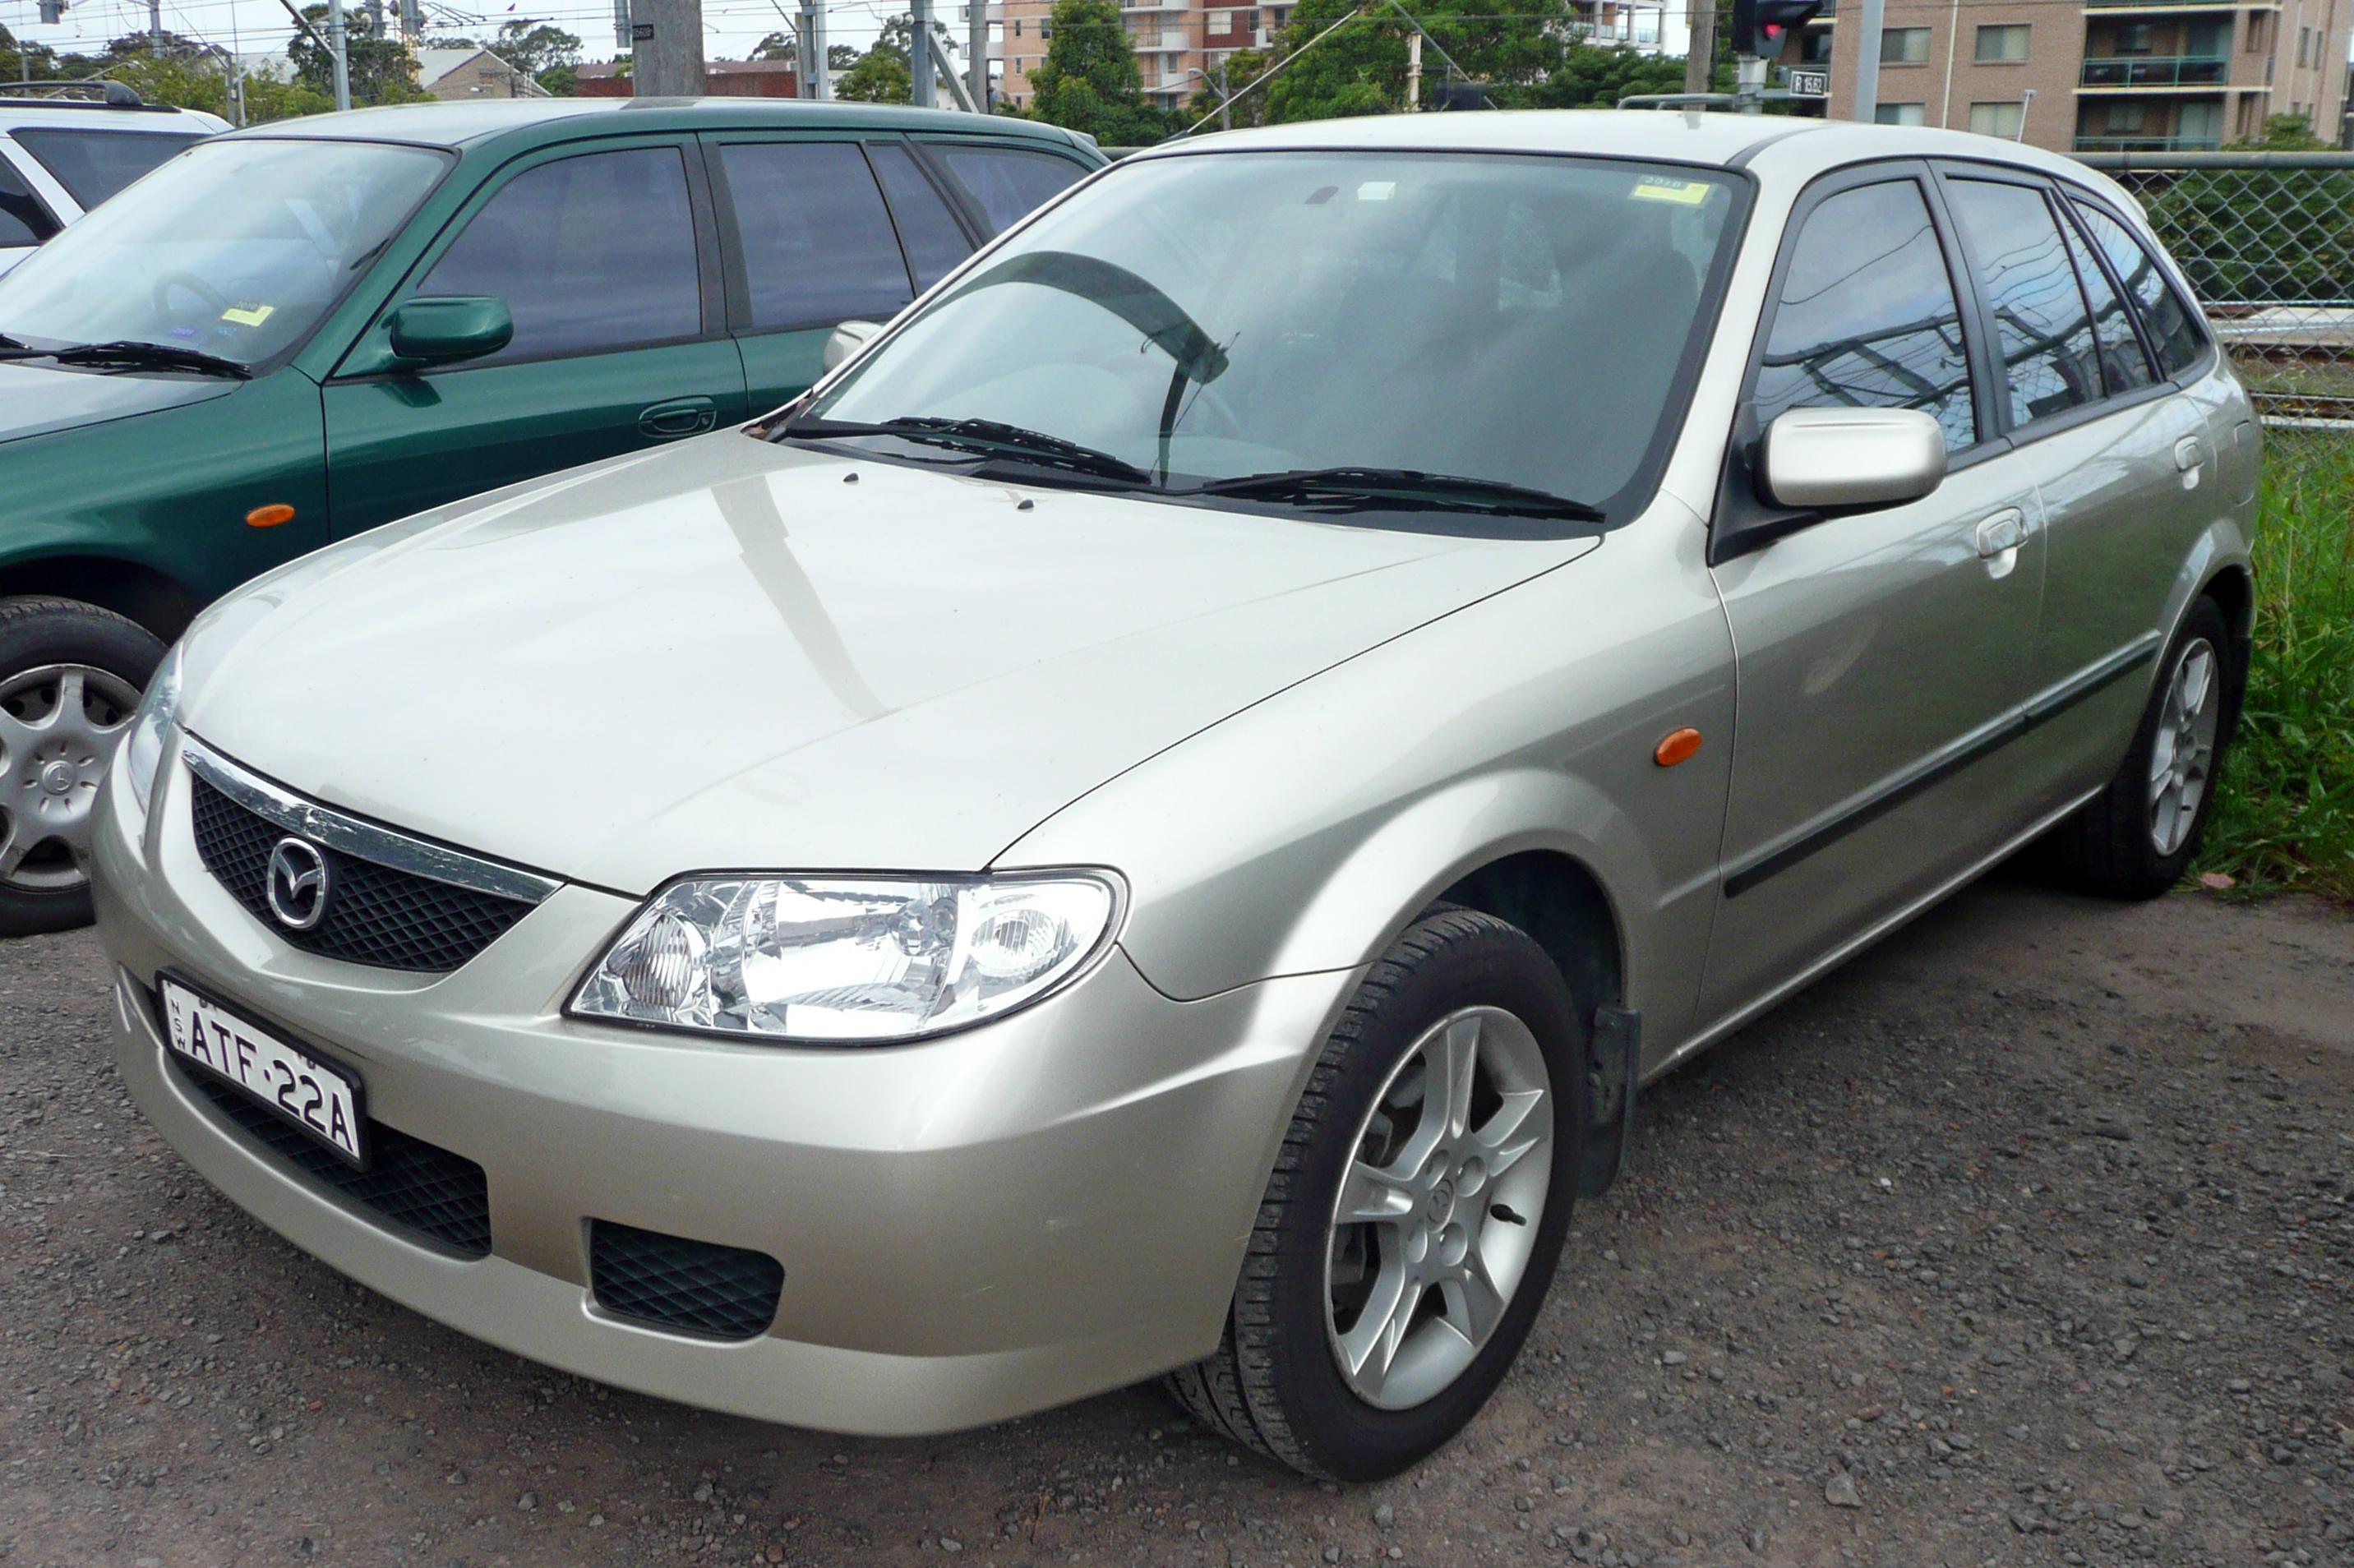 Mazda 3 5 Door >> File:2003 Mazda 323 (BJ II) Astina Shades 5-door hatchback 01.jpg - Wikimedia Commons